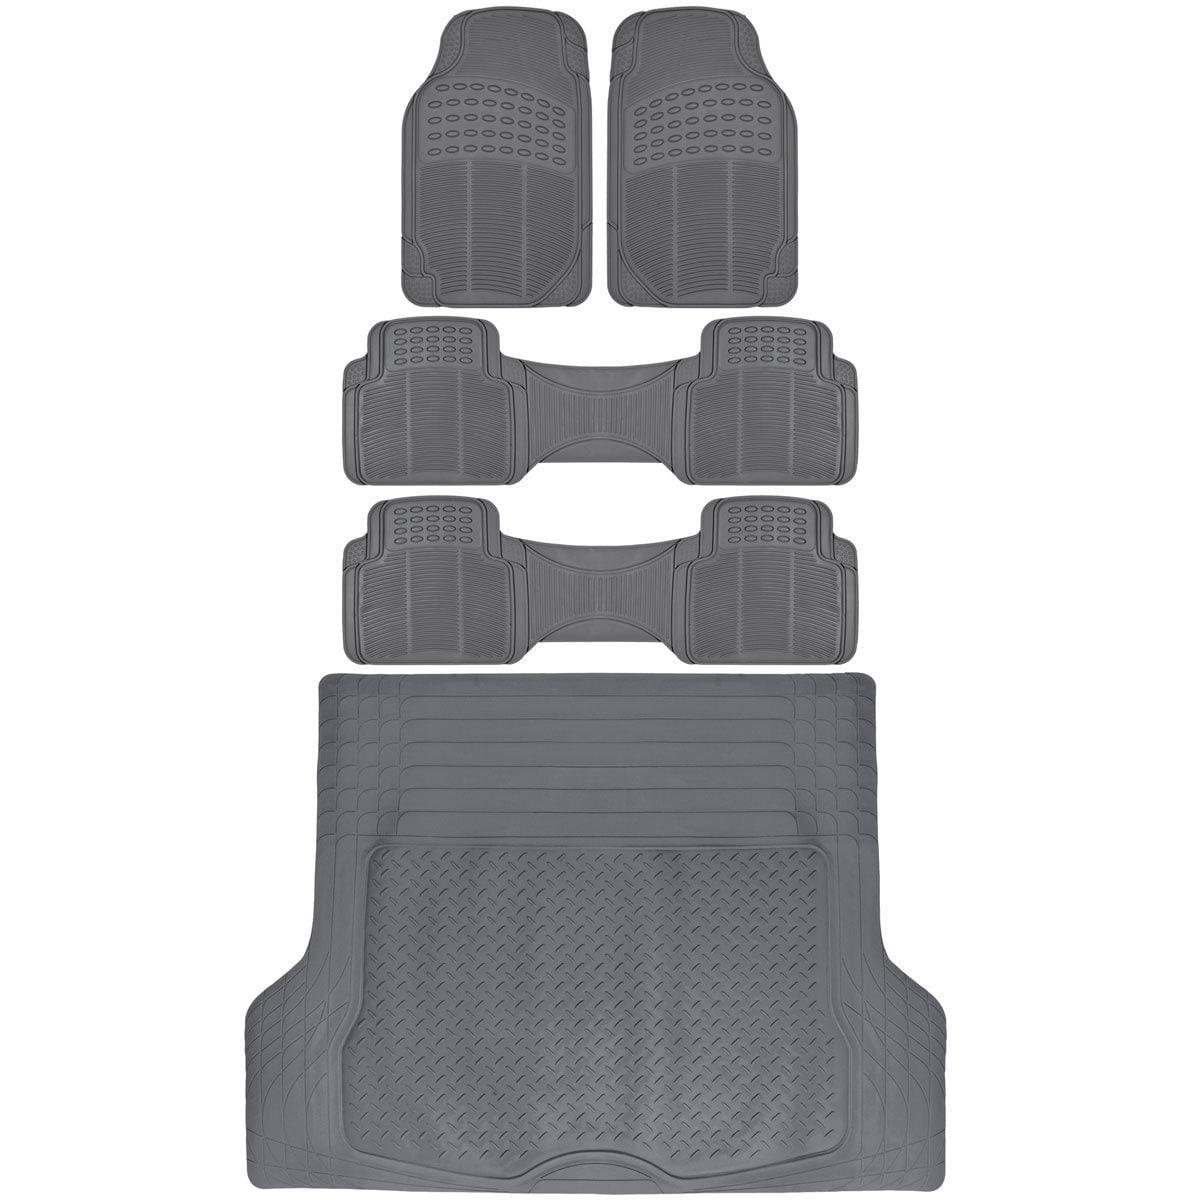 BDK 3 Row Heavy Duty Trimmable Car Floor Mats for SUV/ Va...